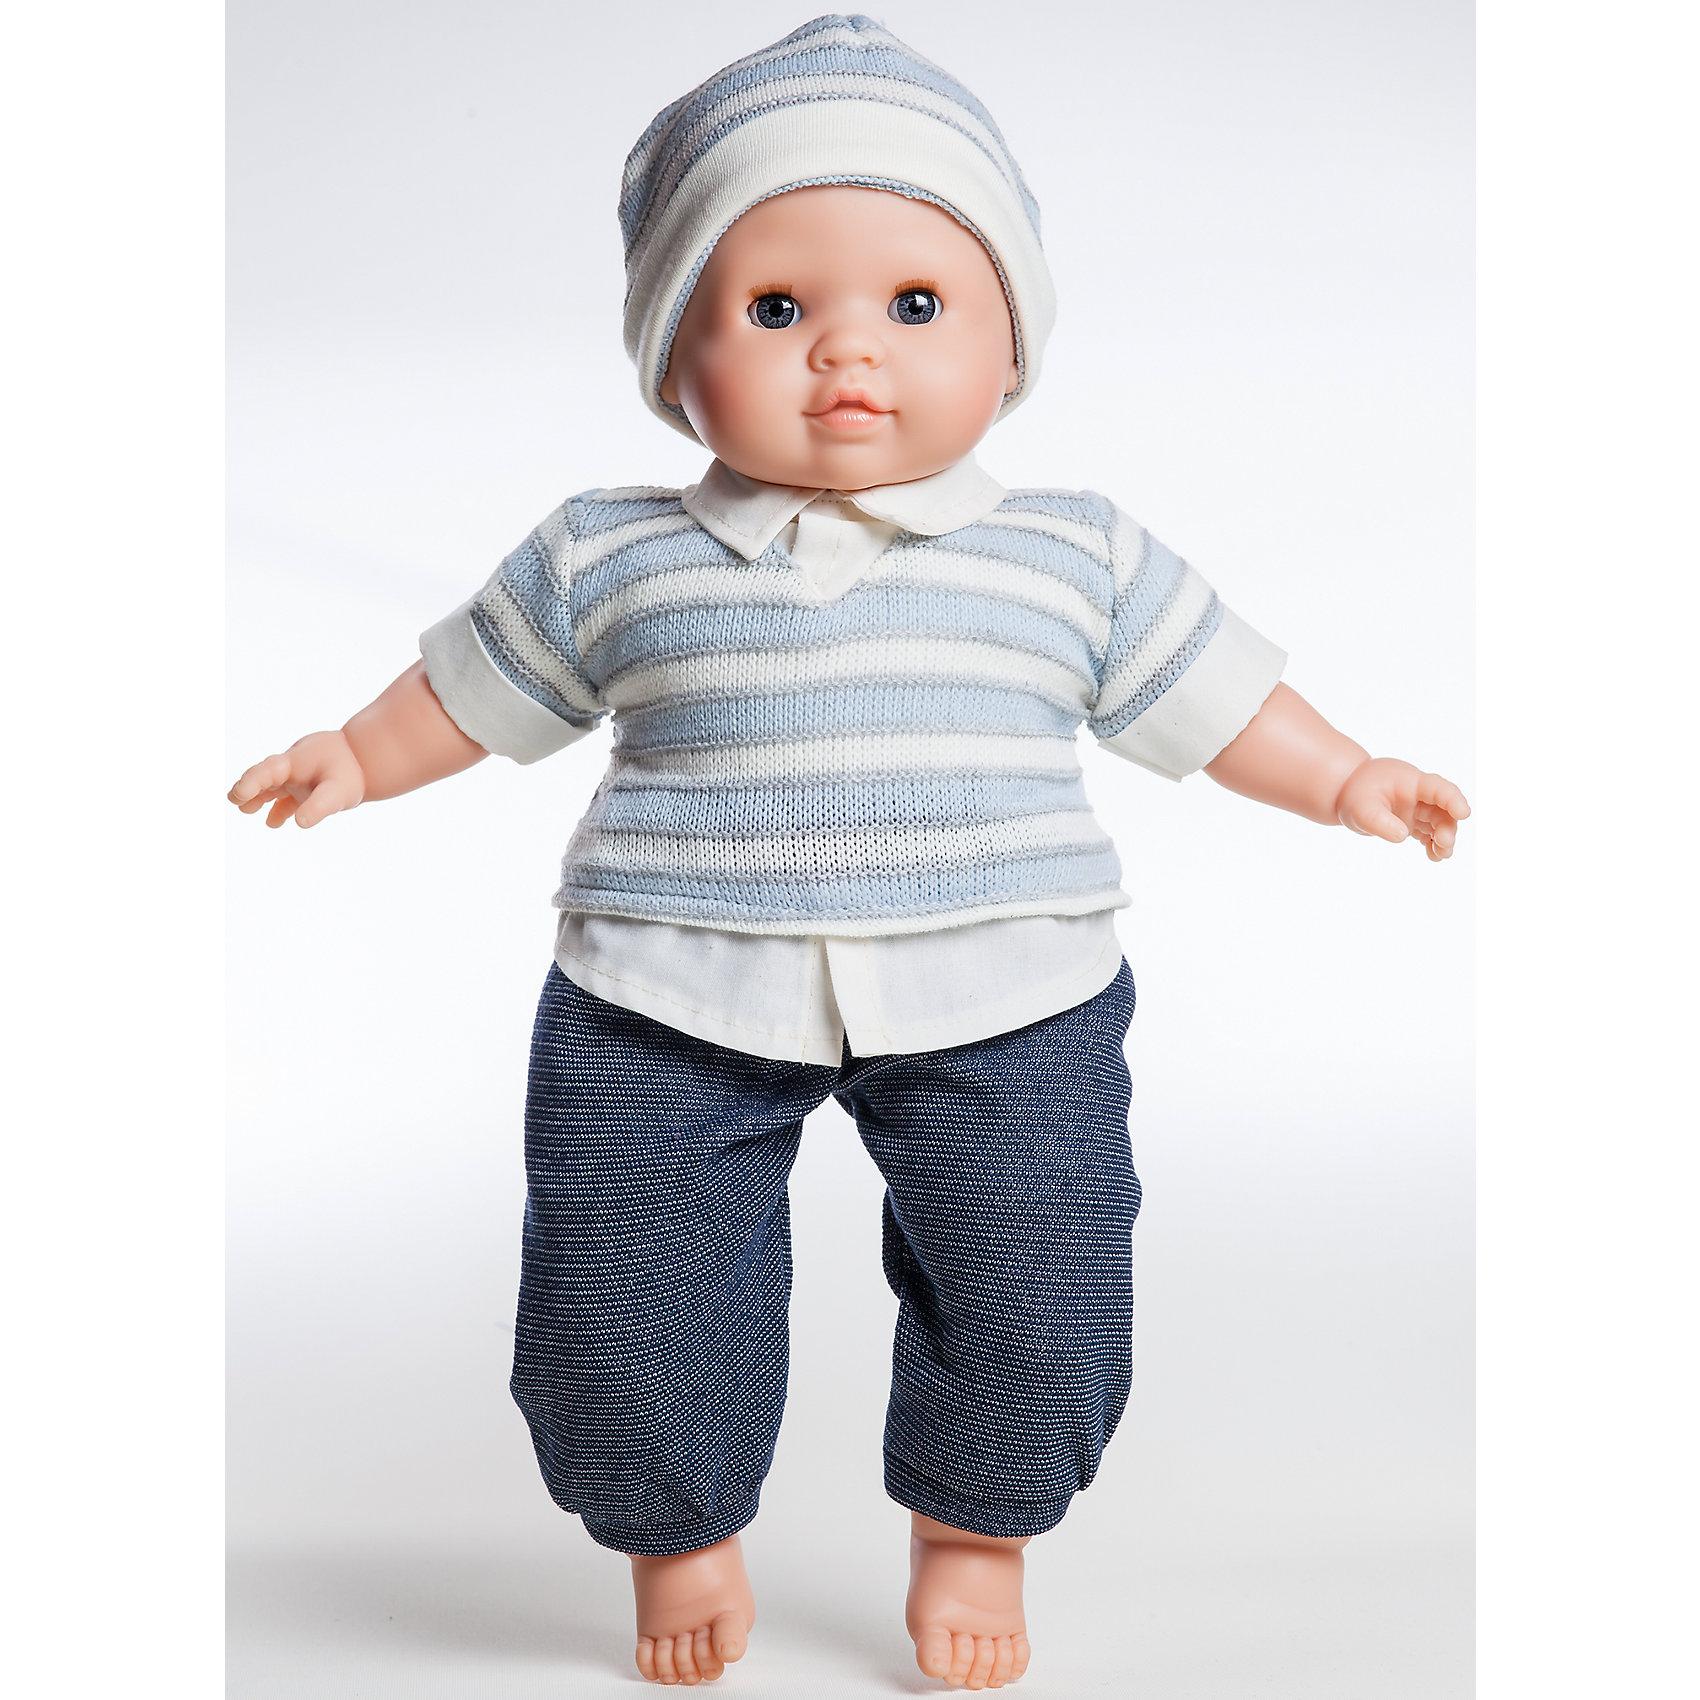 Paola Reina Кукла Ману, 36 см, Paola Reina paola reina кукла иза 47 см